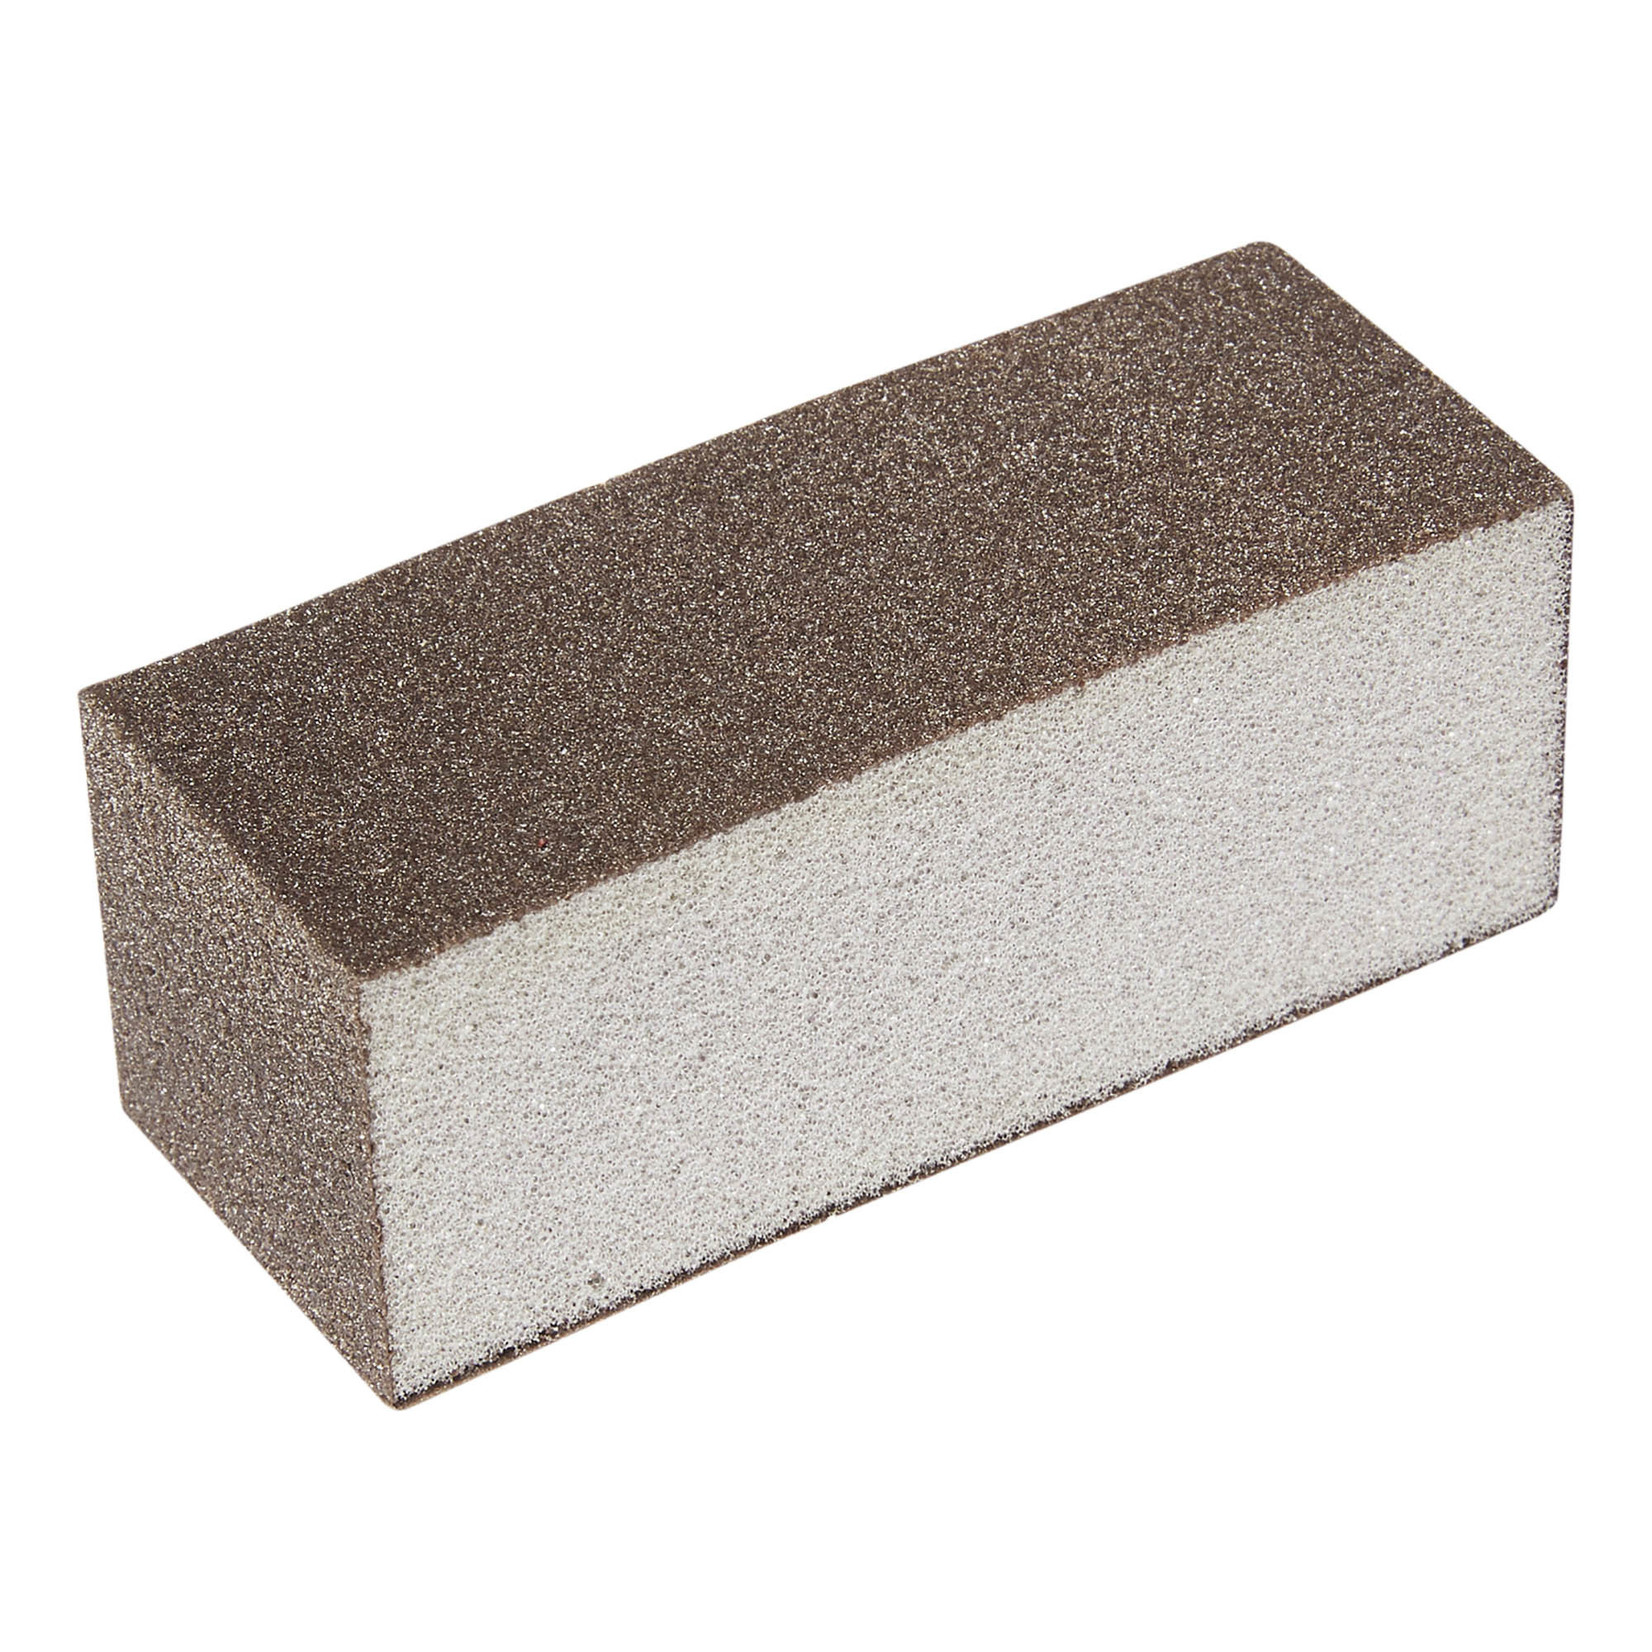 Black Diamond Polissoir Black Diamond Sanding Block